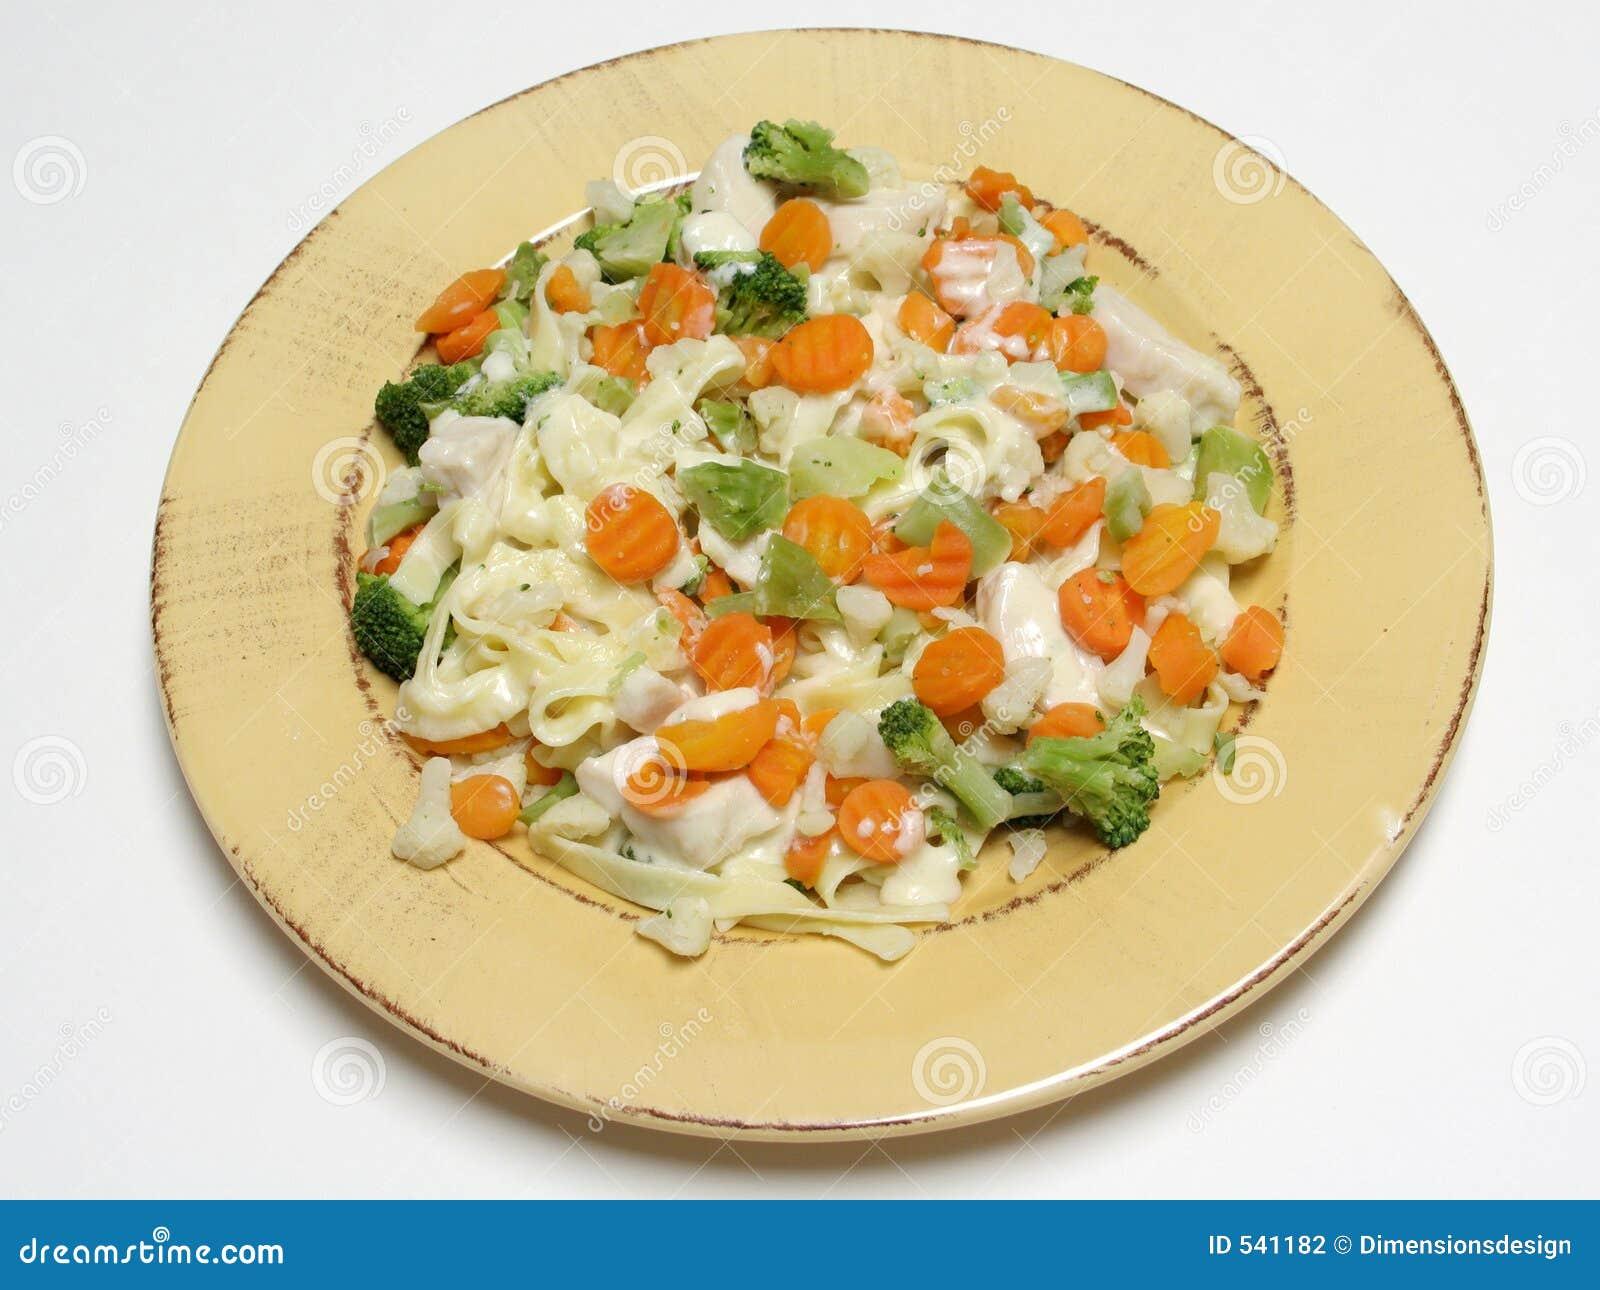 Download Fettucine蔬菜 库存照片. 图片 包括有 brochette, 托斯卡纳, 健康, 花椰菜, 查出, 淀粉 - 541182